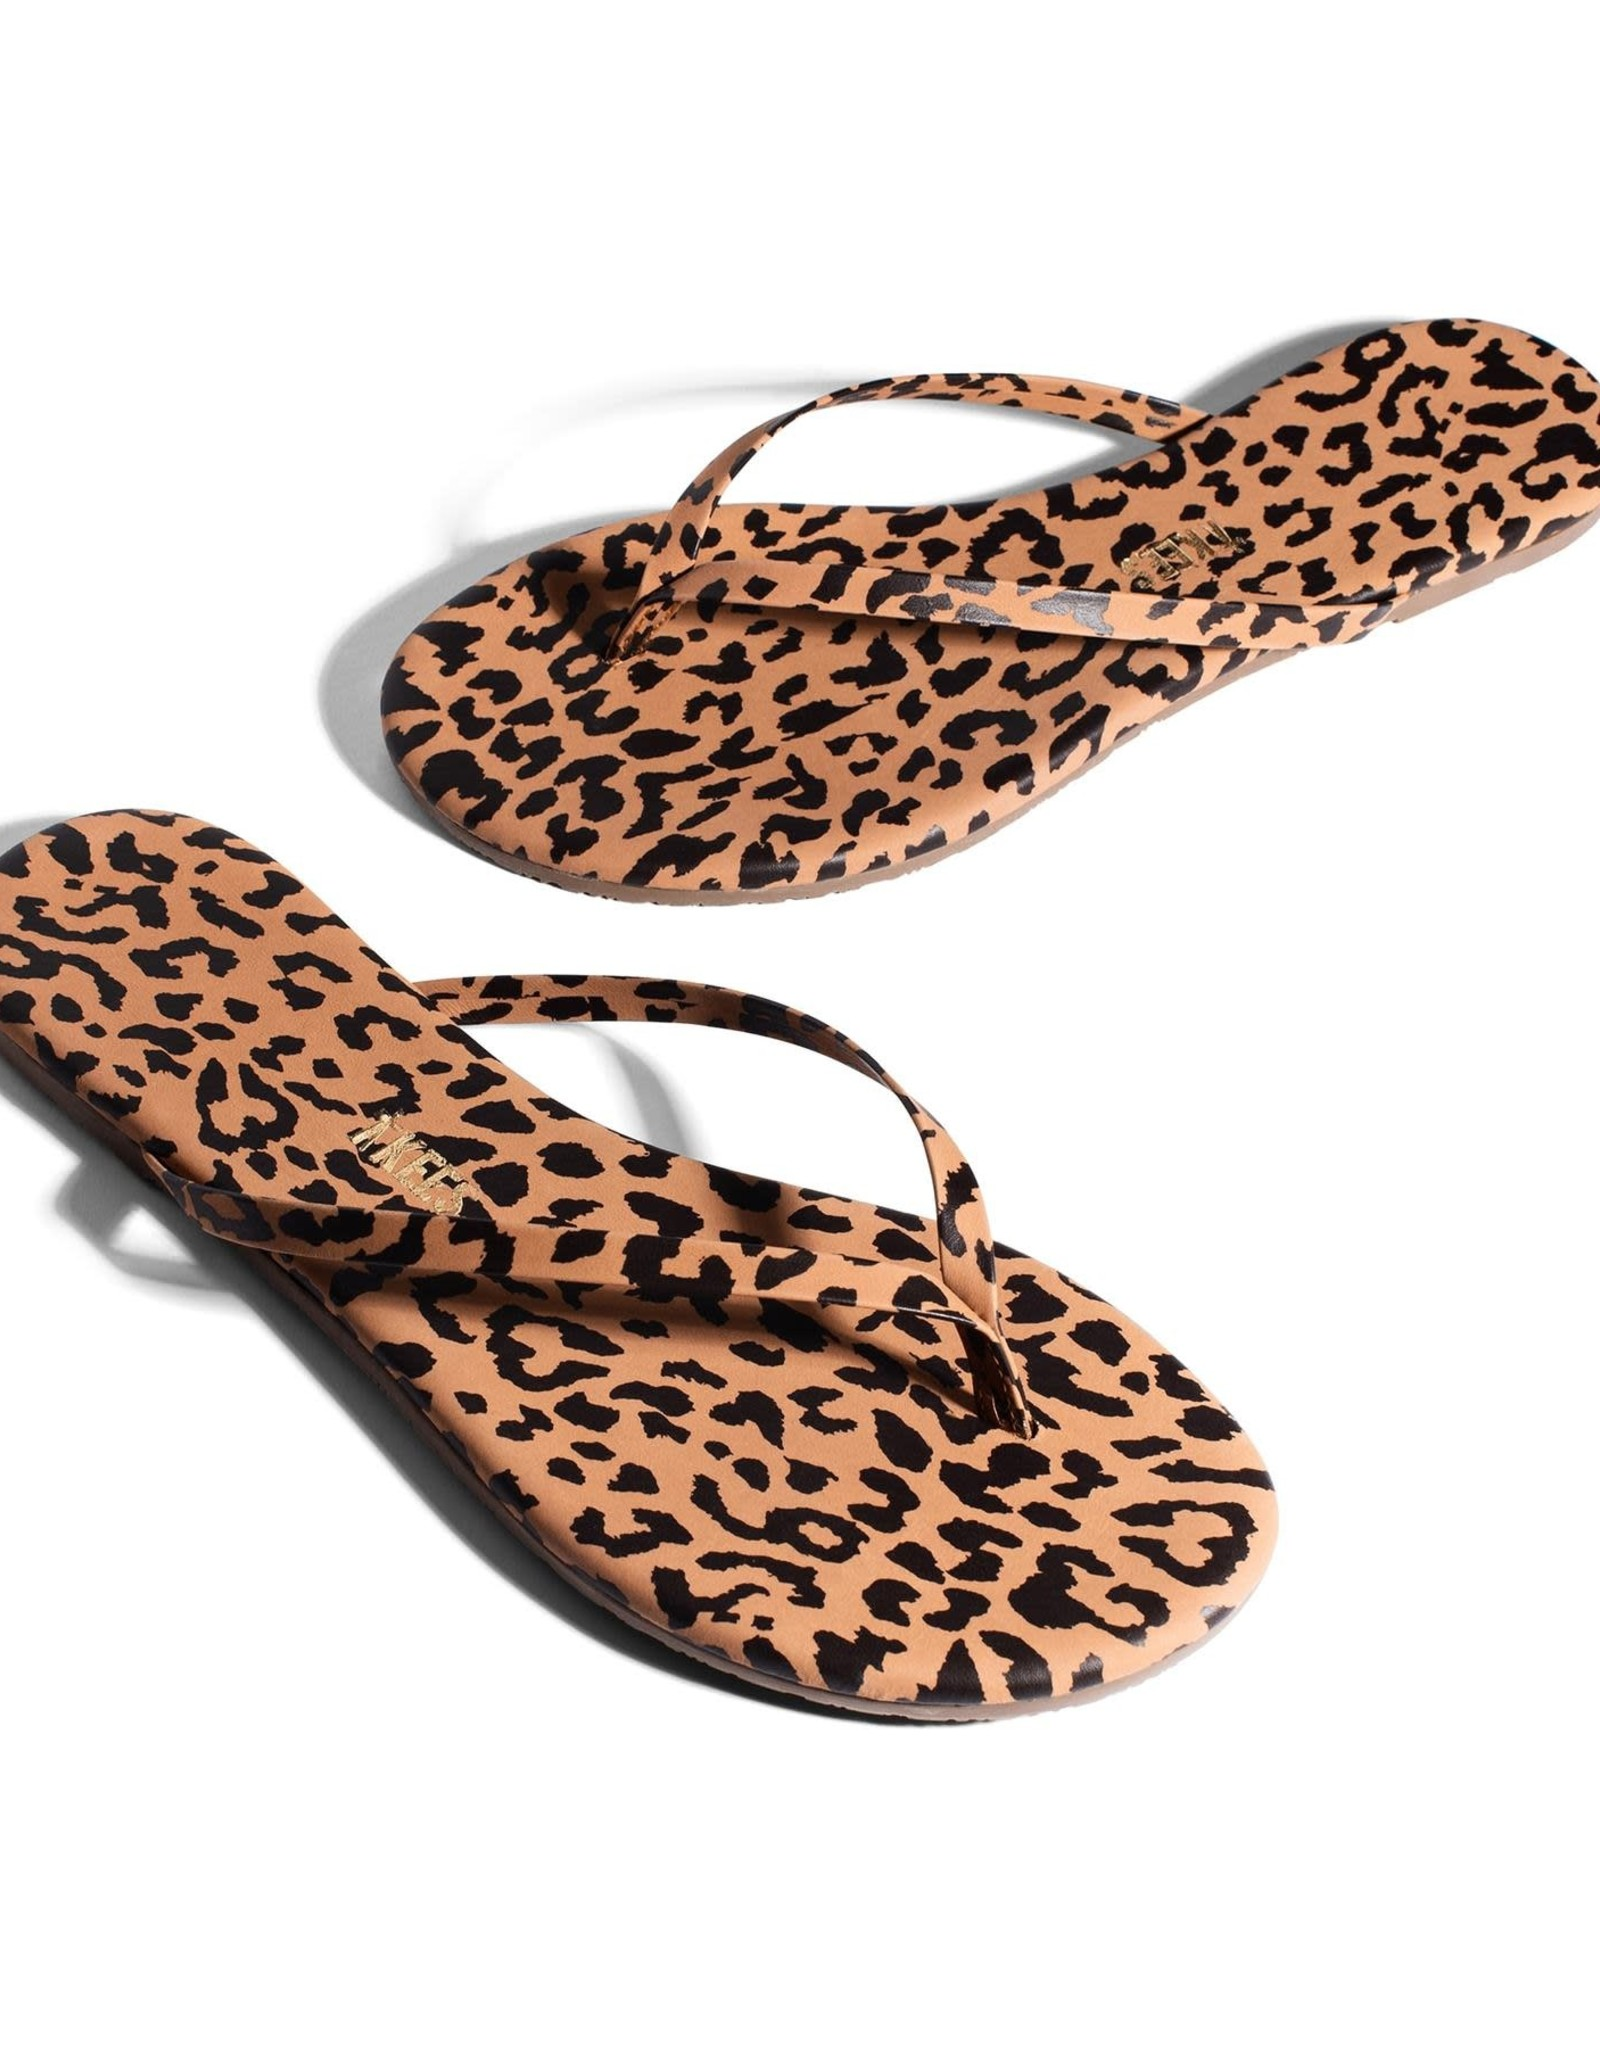 Tkees INC Tkees Studio Exotic Cheetah